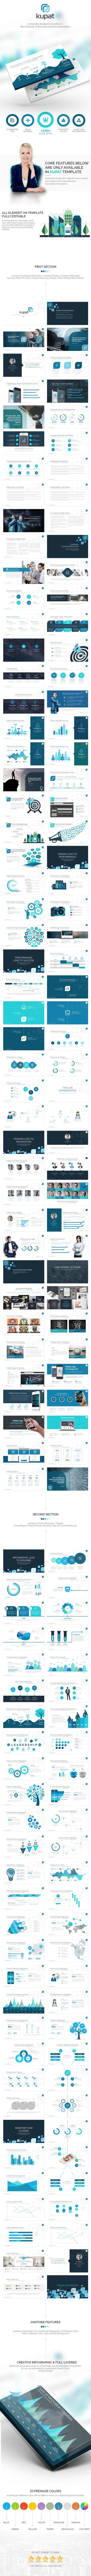 Kupat - Big Deal Powerpoint Template - Business PowerPoint Templates